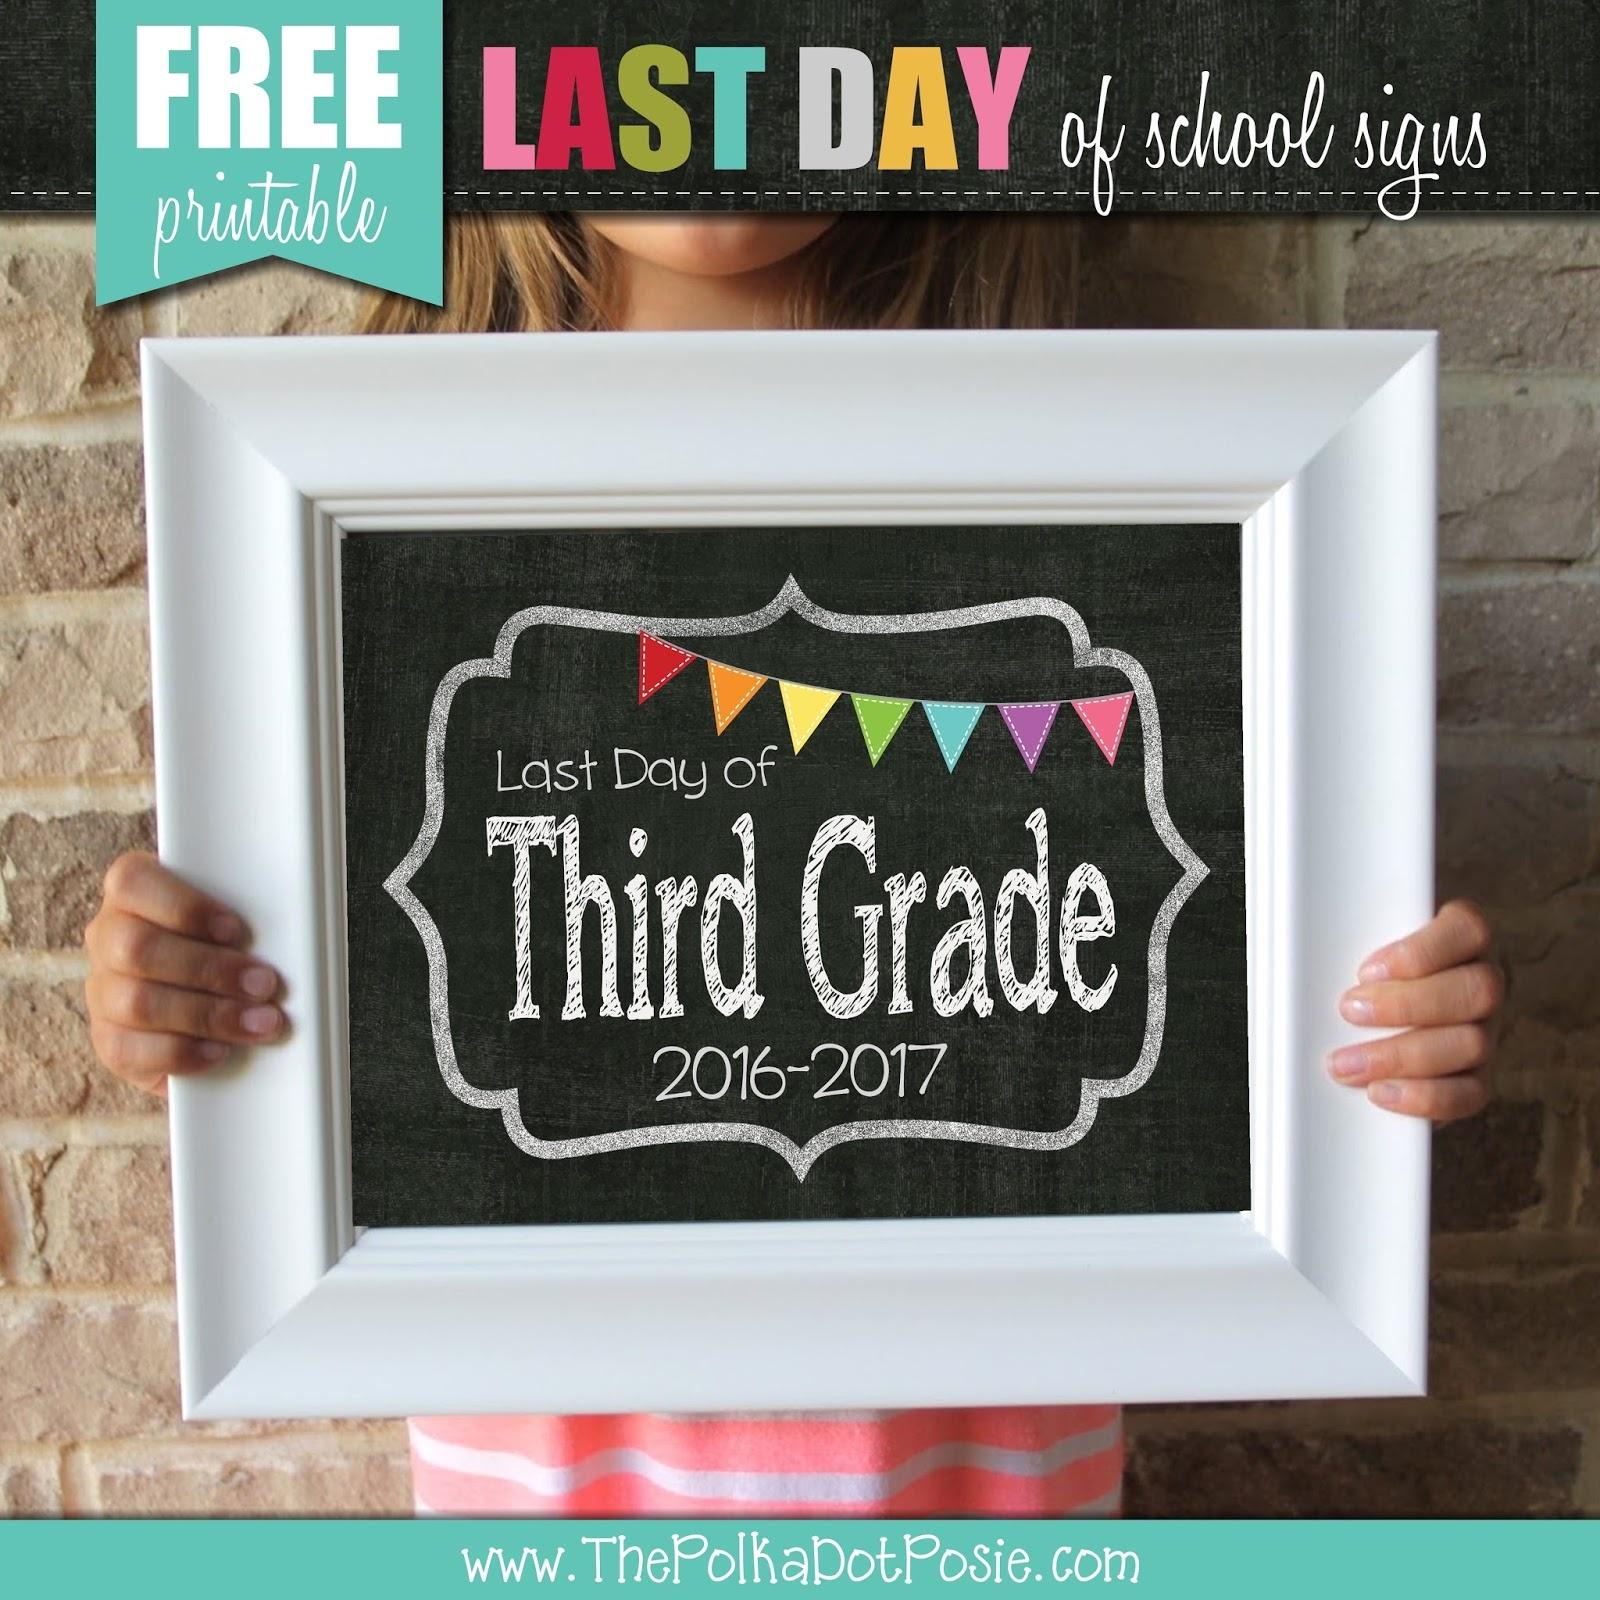 The Polka Dot Posie: Free Printable Last Day Of School Signs! - Free Printable Back To School Signs 2017